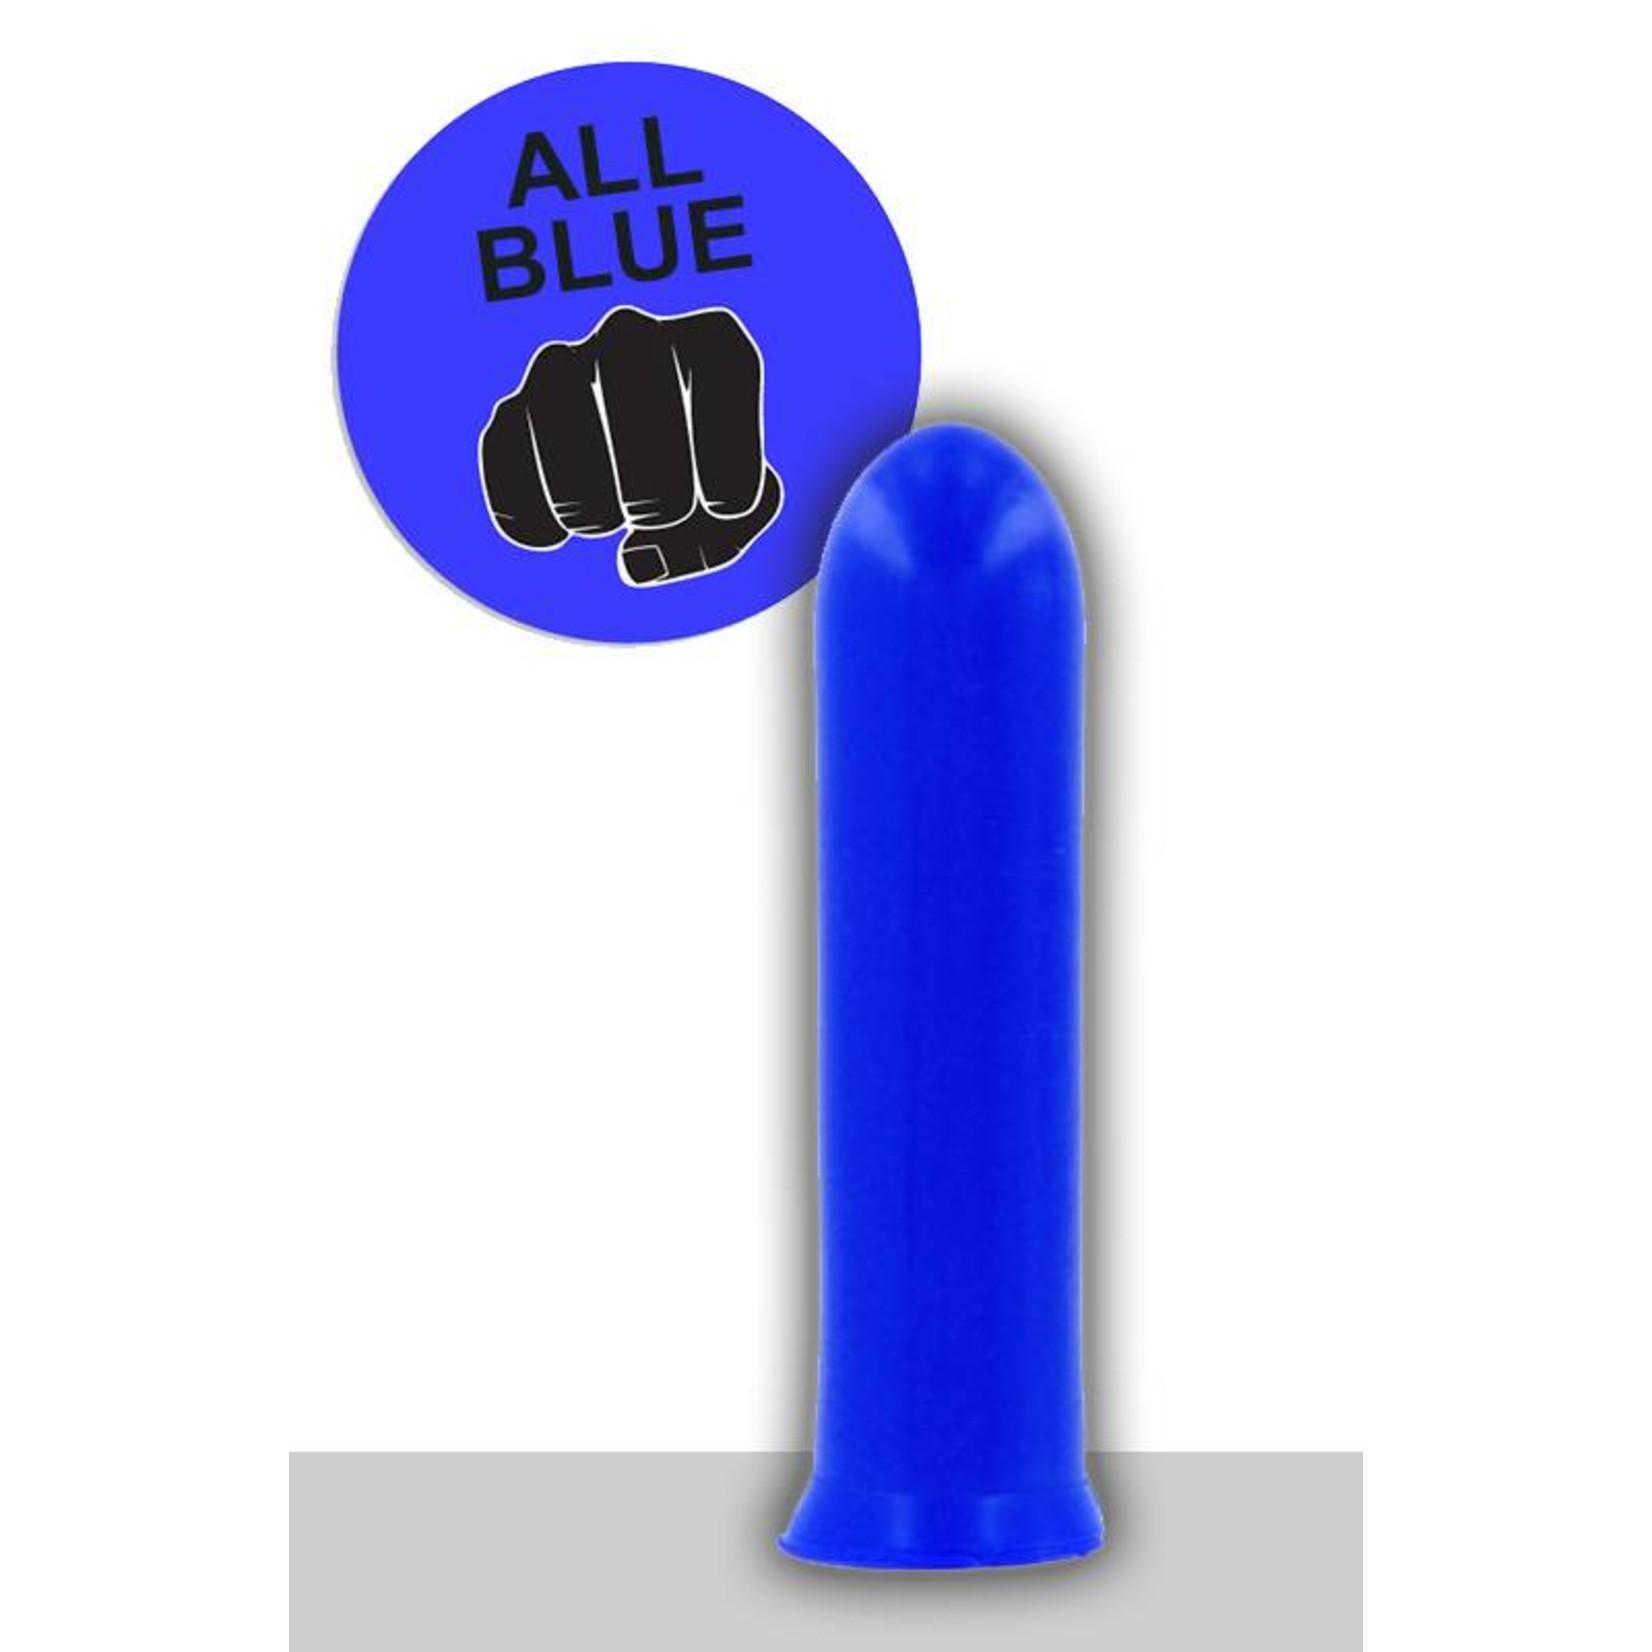 All Black All Blue Dildo - ABB 08